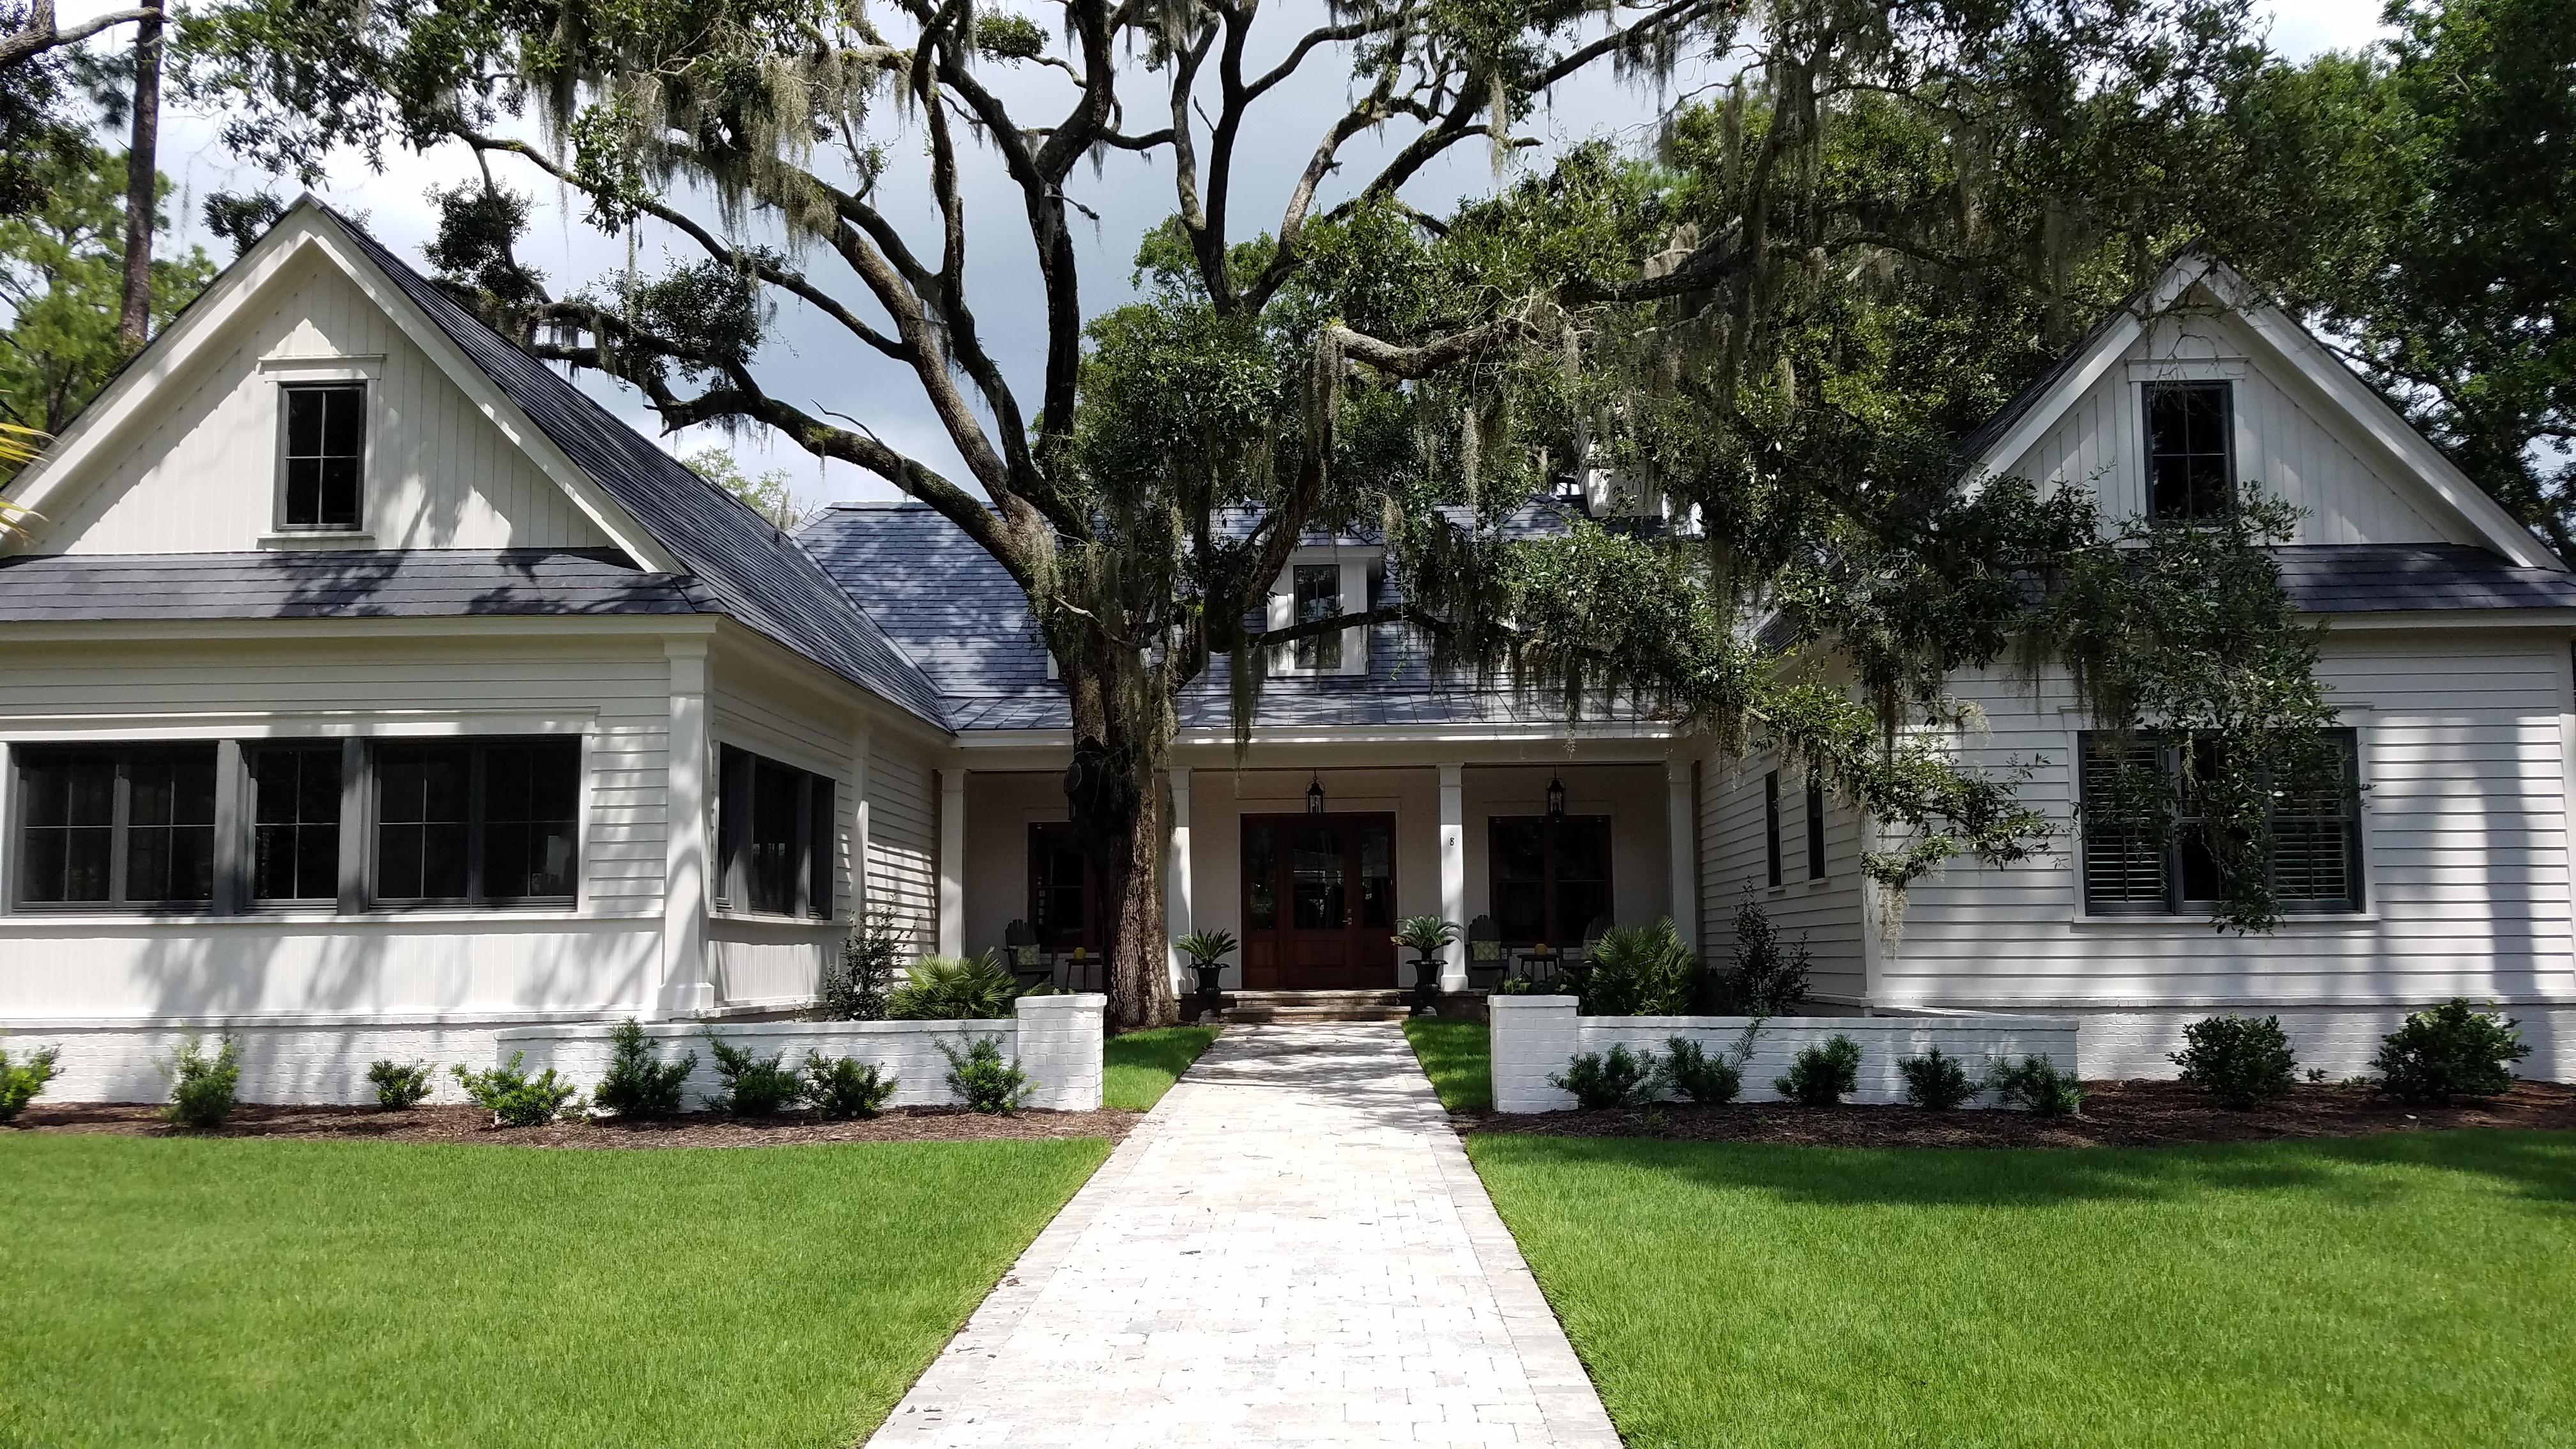 Legacy House, Compass Custom Homes, Model, Palmetto Bluff, Bluffton SC